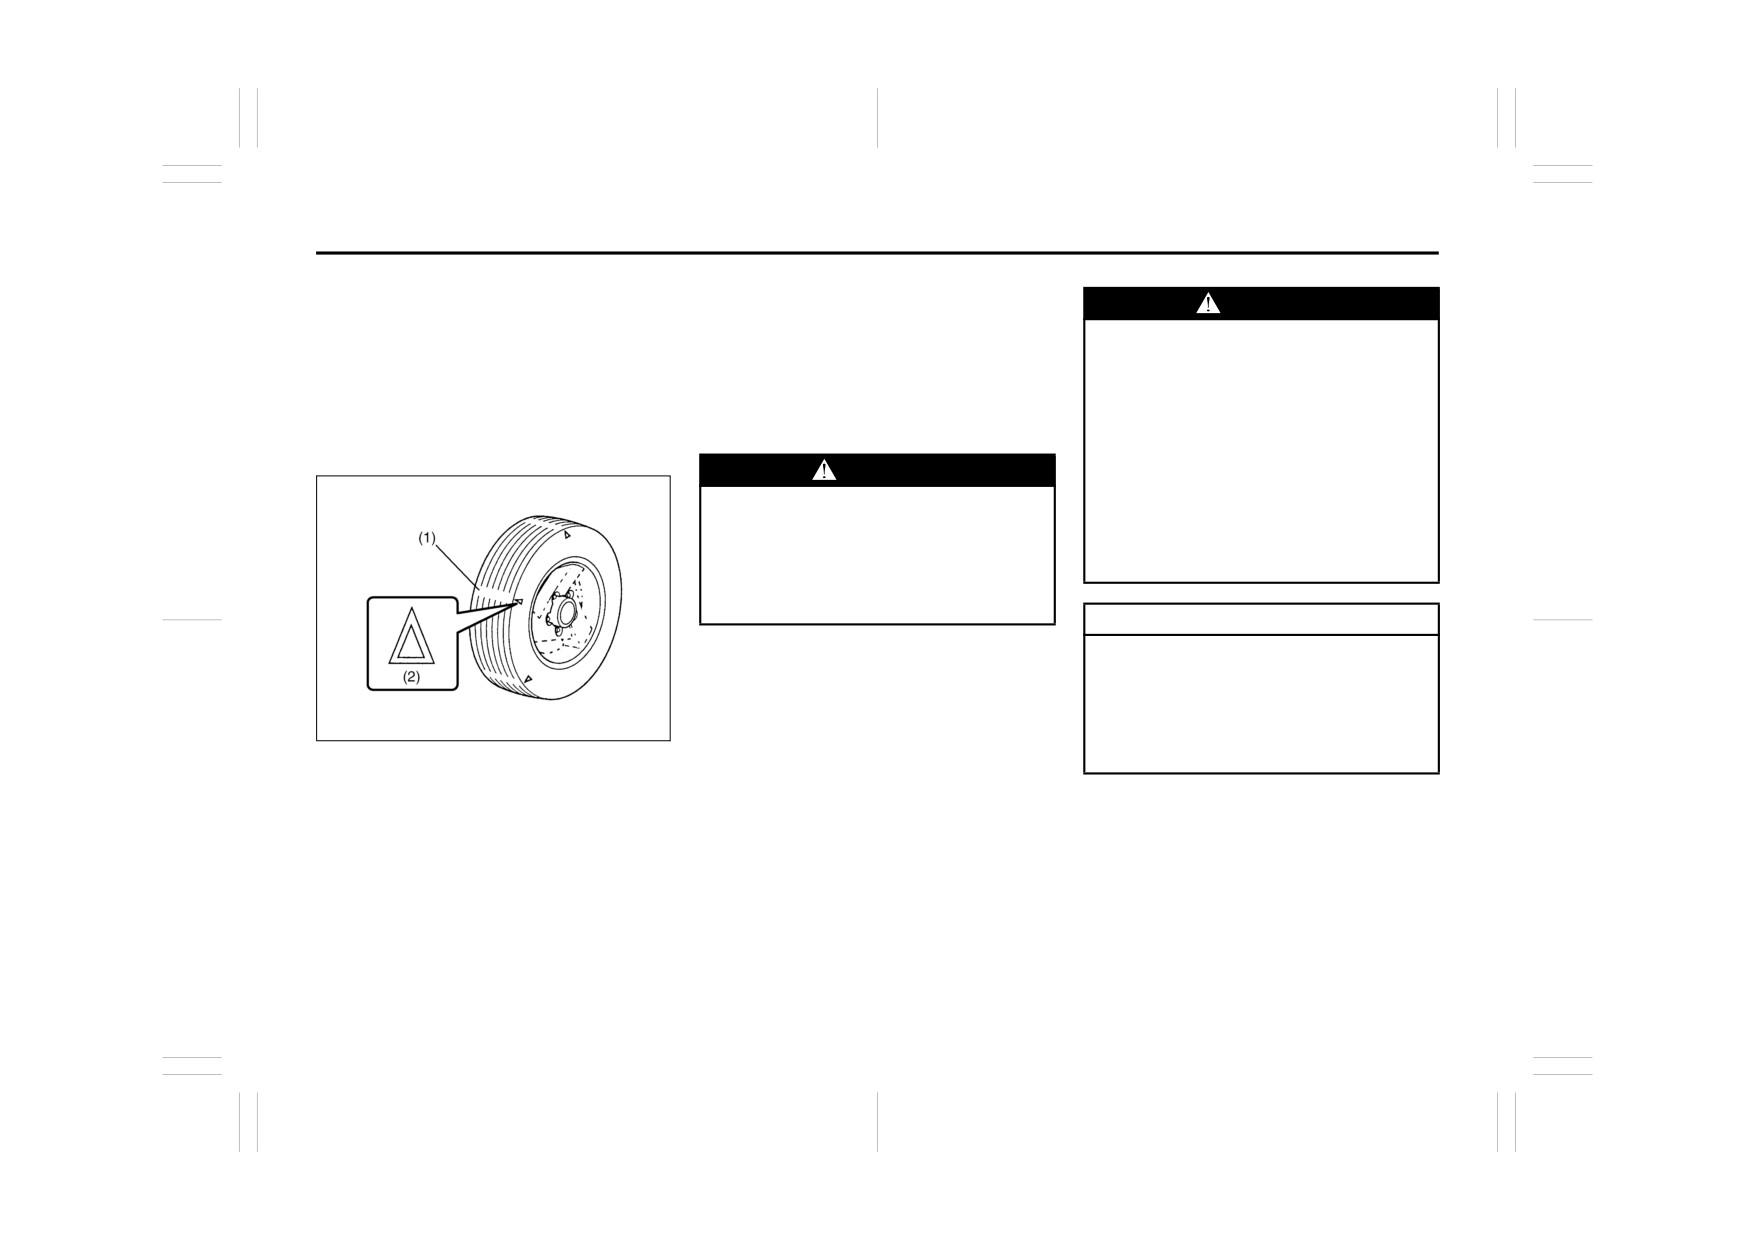 Suzuki SX4 (2010 year). Manual - part 14 on 2010 jeep wrangler fuse box location, 2010 jeep grand cherokee fuse box location, 2006 suzuki xl7 fuse box location,